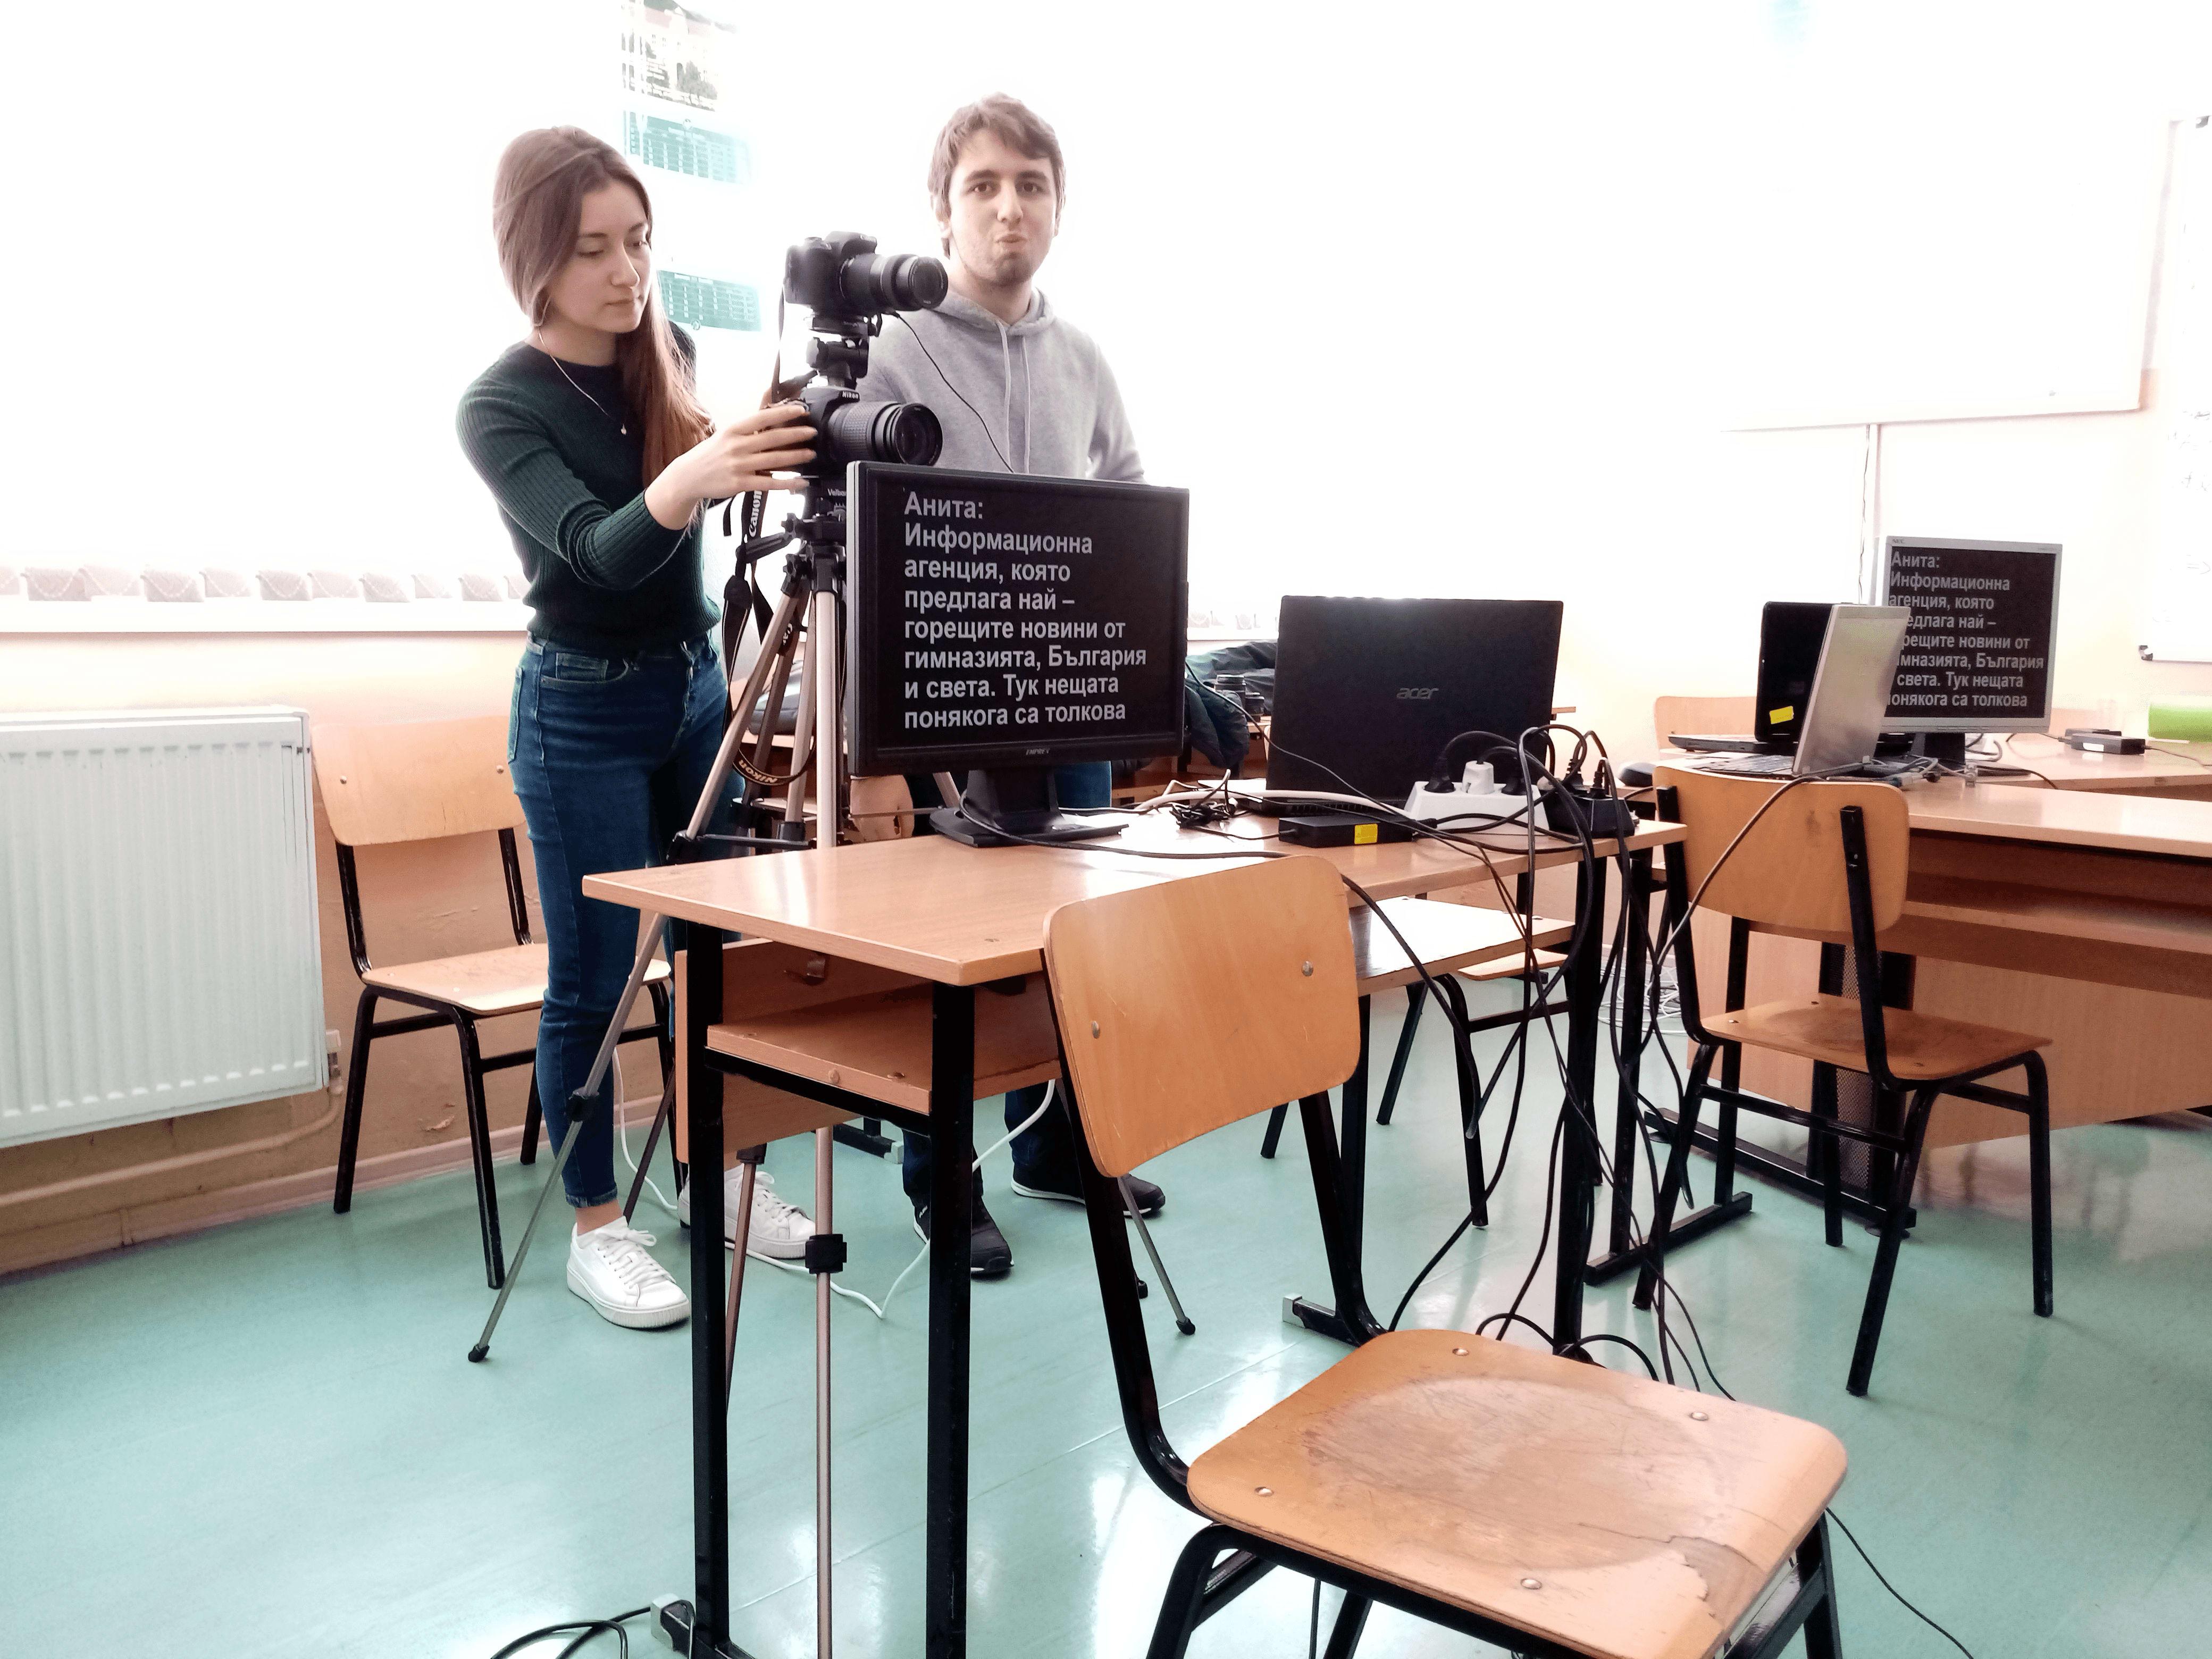 Slide 7 - ППМГ ТВ Сливен - Един ден на снимачната площадка